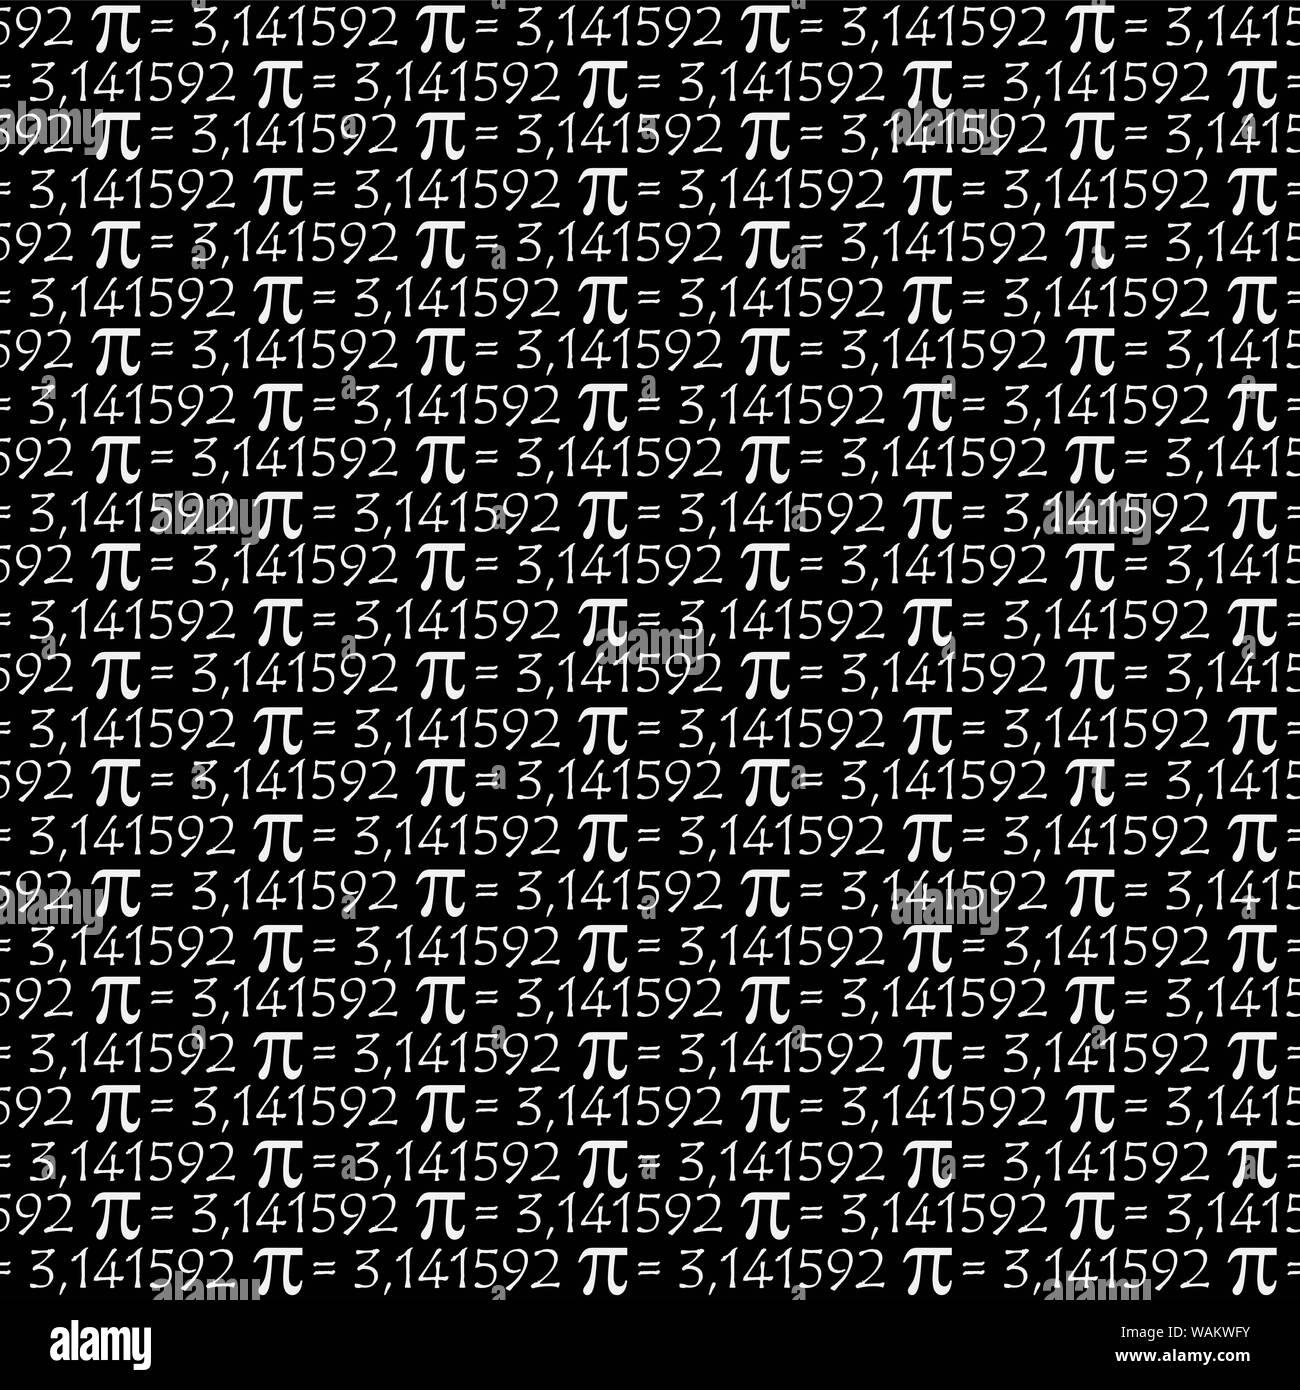 Letter Pattern In Math - Letter